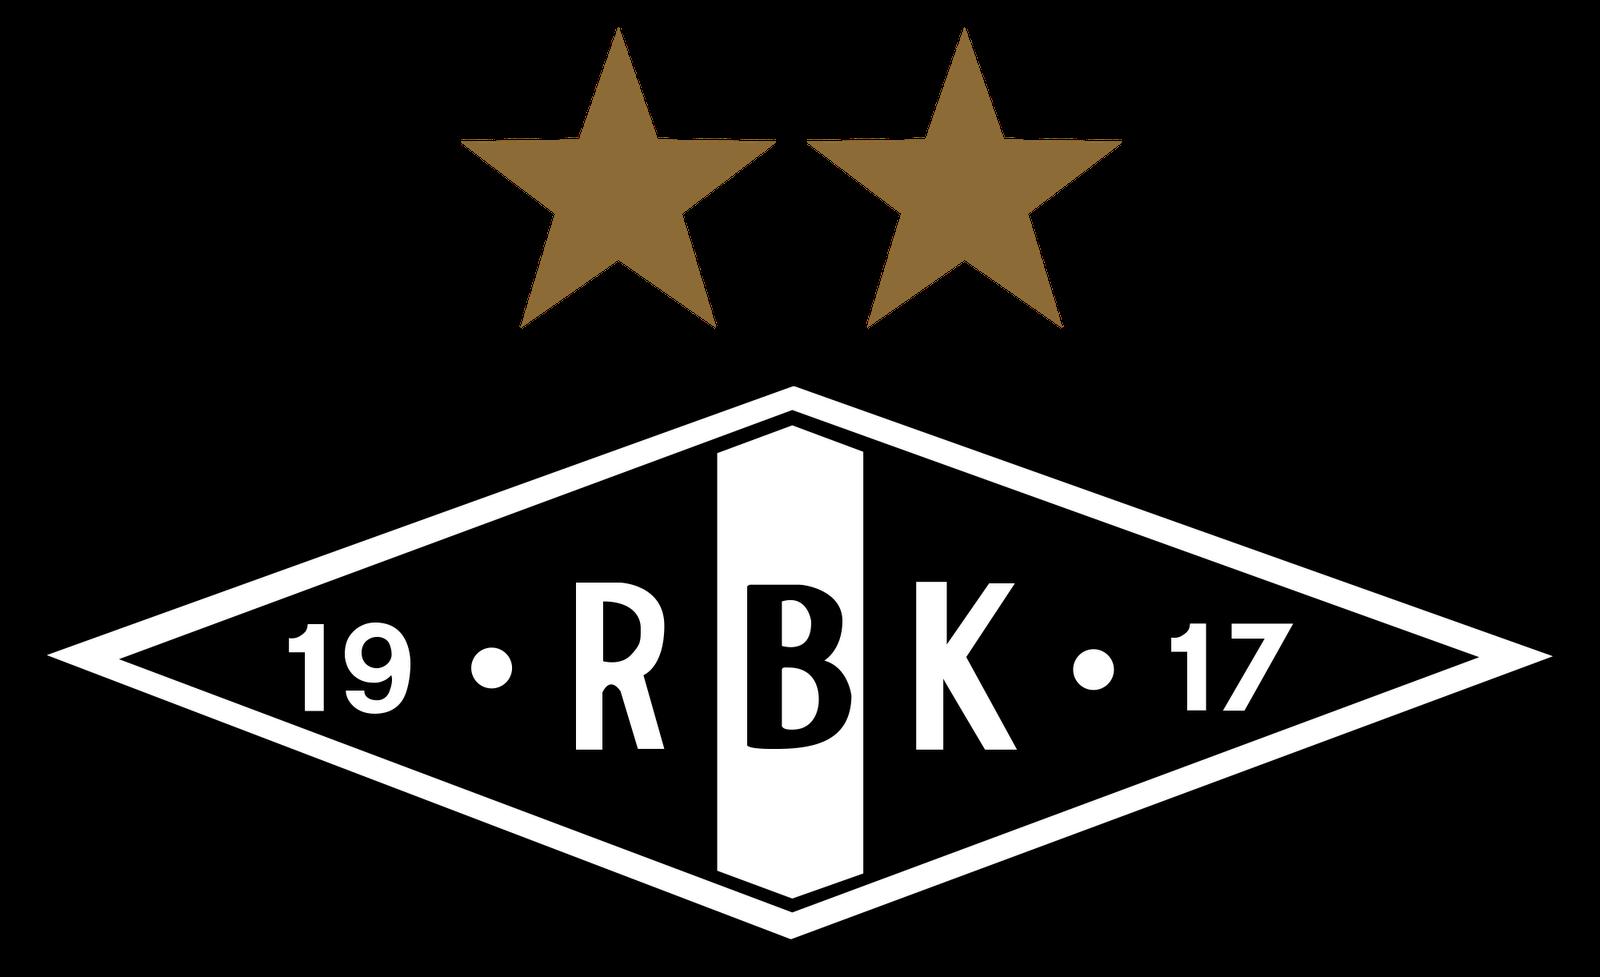 Bk Logo | Best | Free |